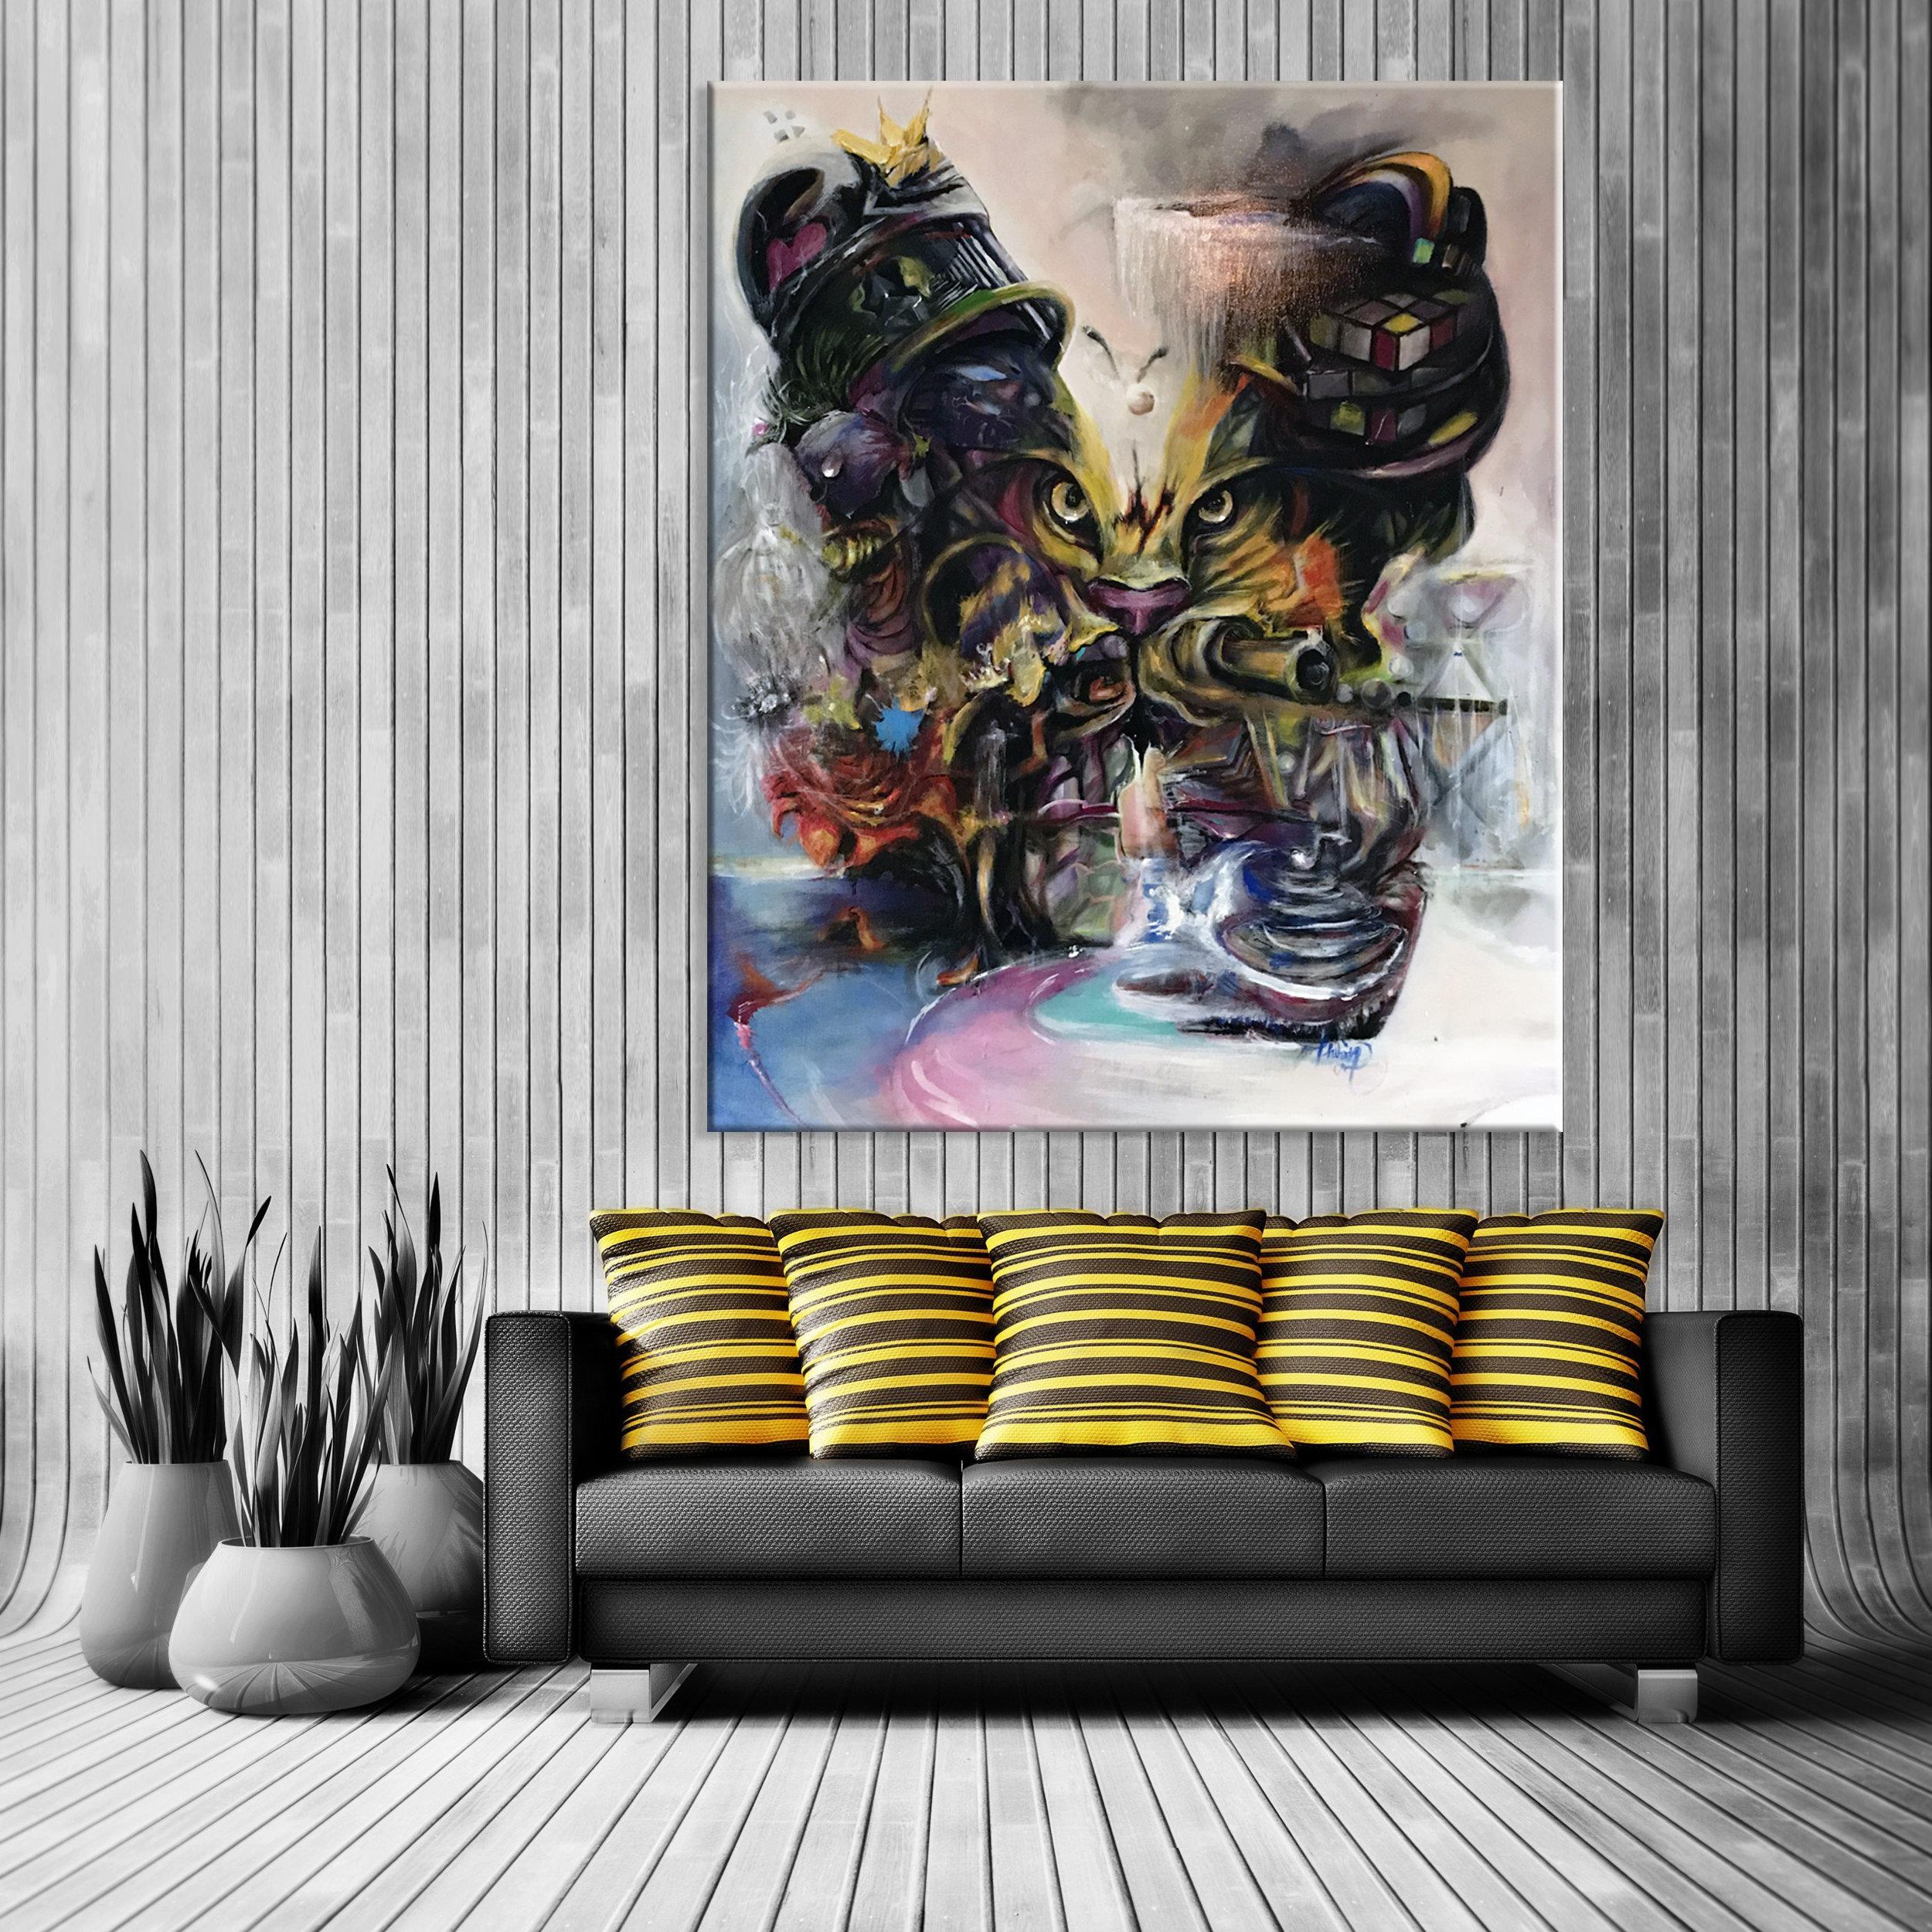 minimalist-sofa-plants-interior-room-style-design-hd-wallpaper.jpg